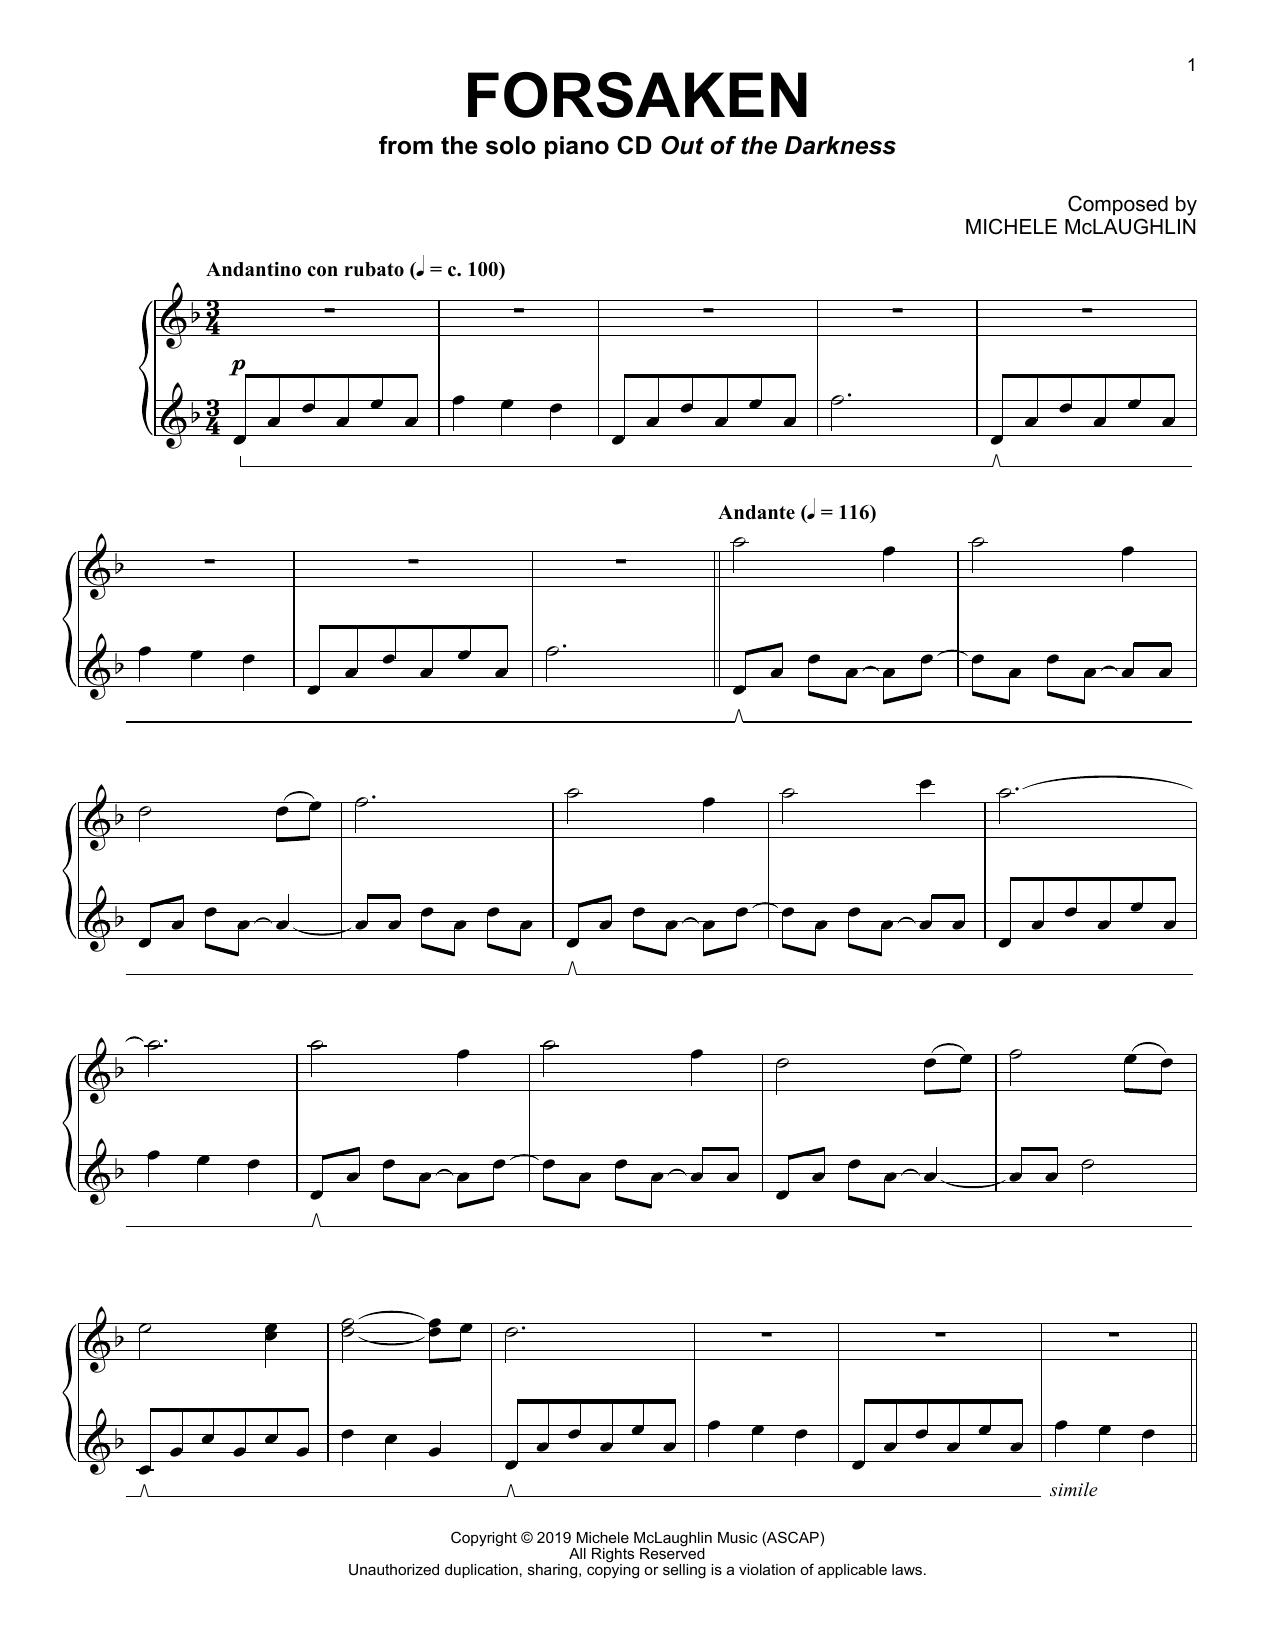 Michele McLaughlin Forsaken sheet music notes and chords. Download Printable PDF.